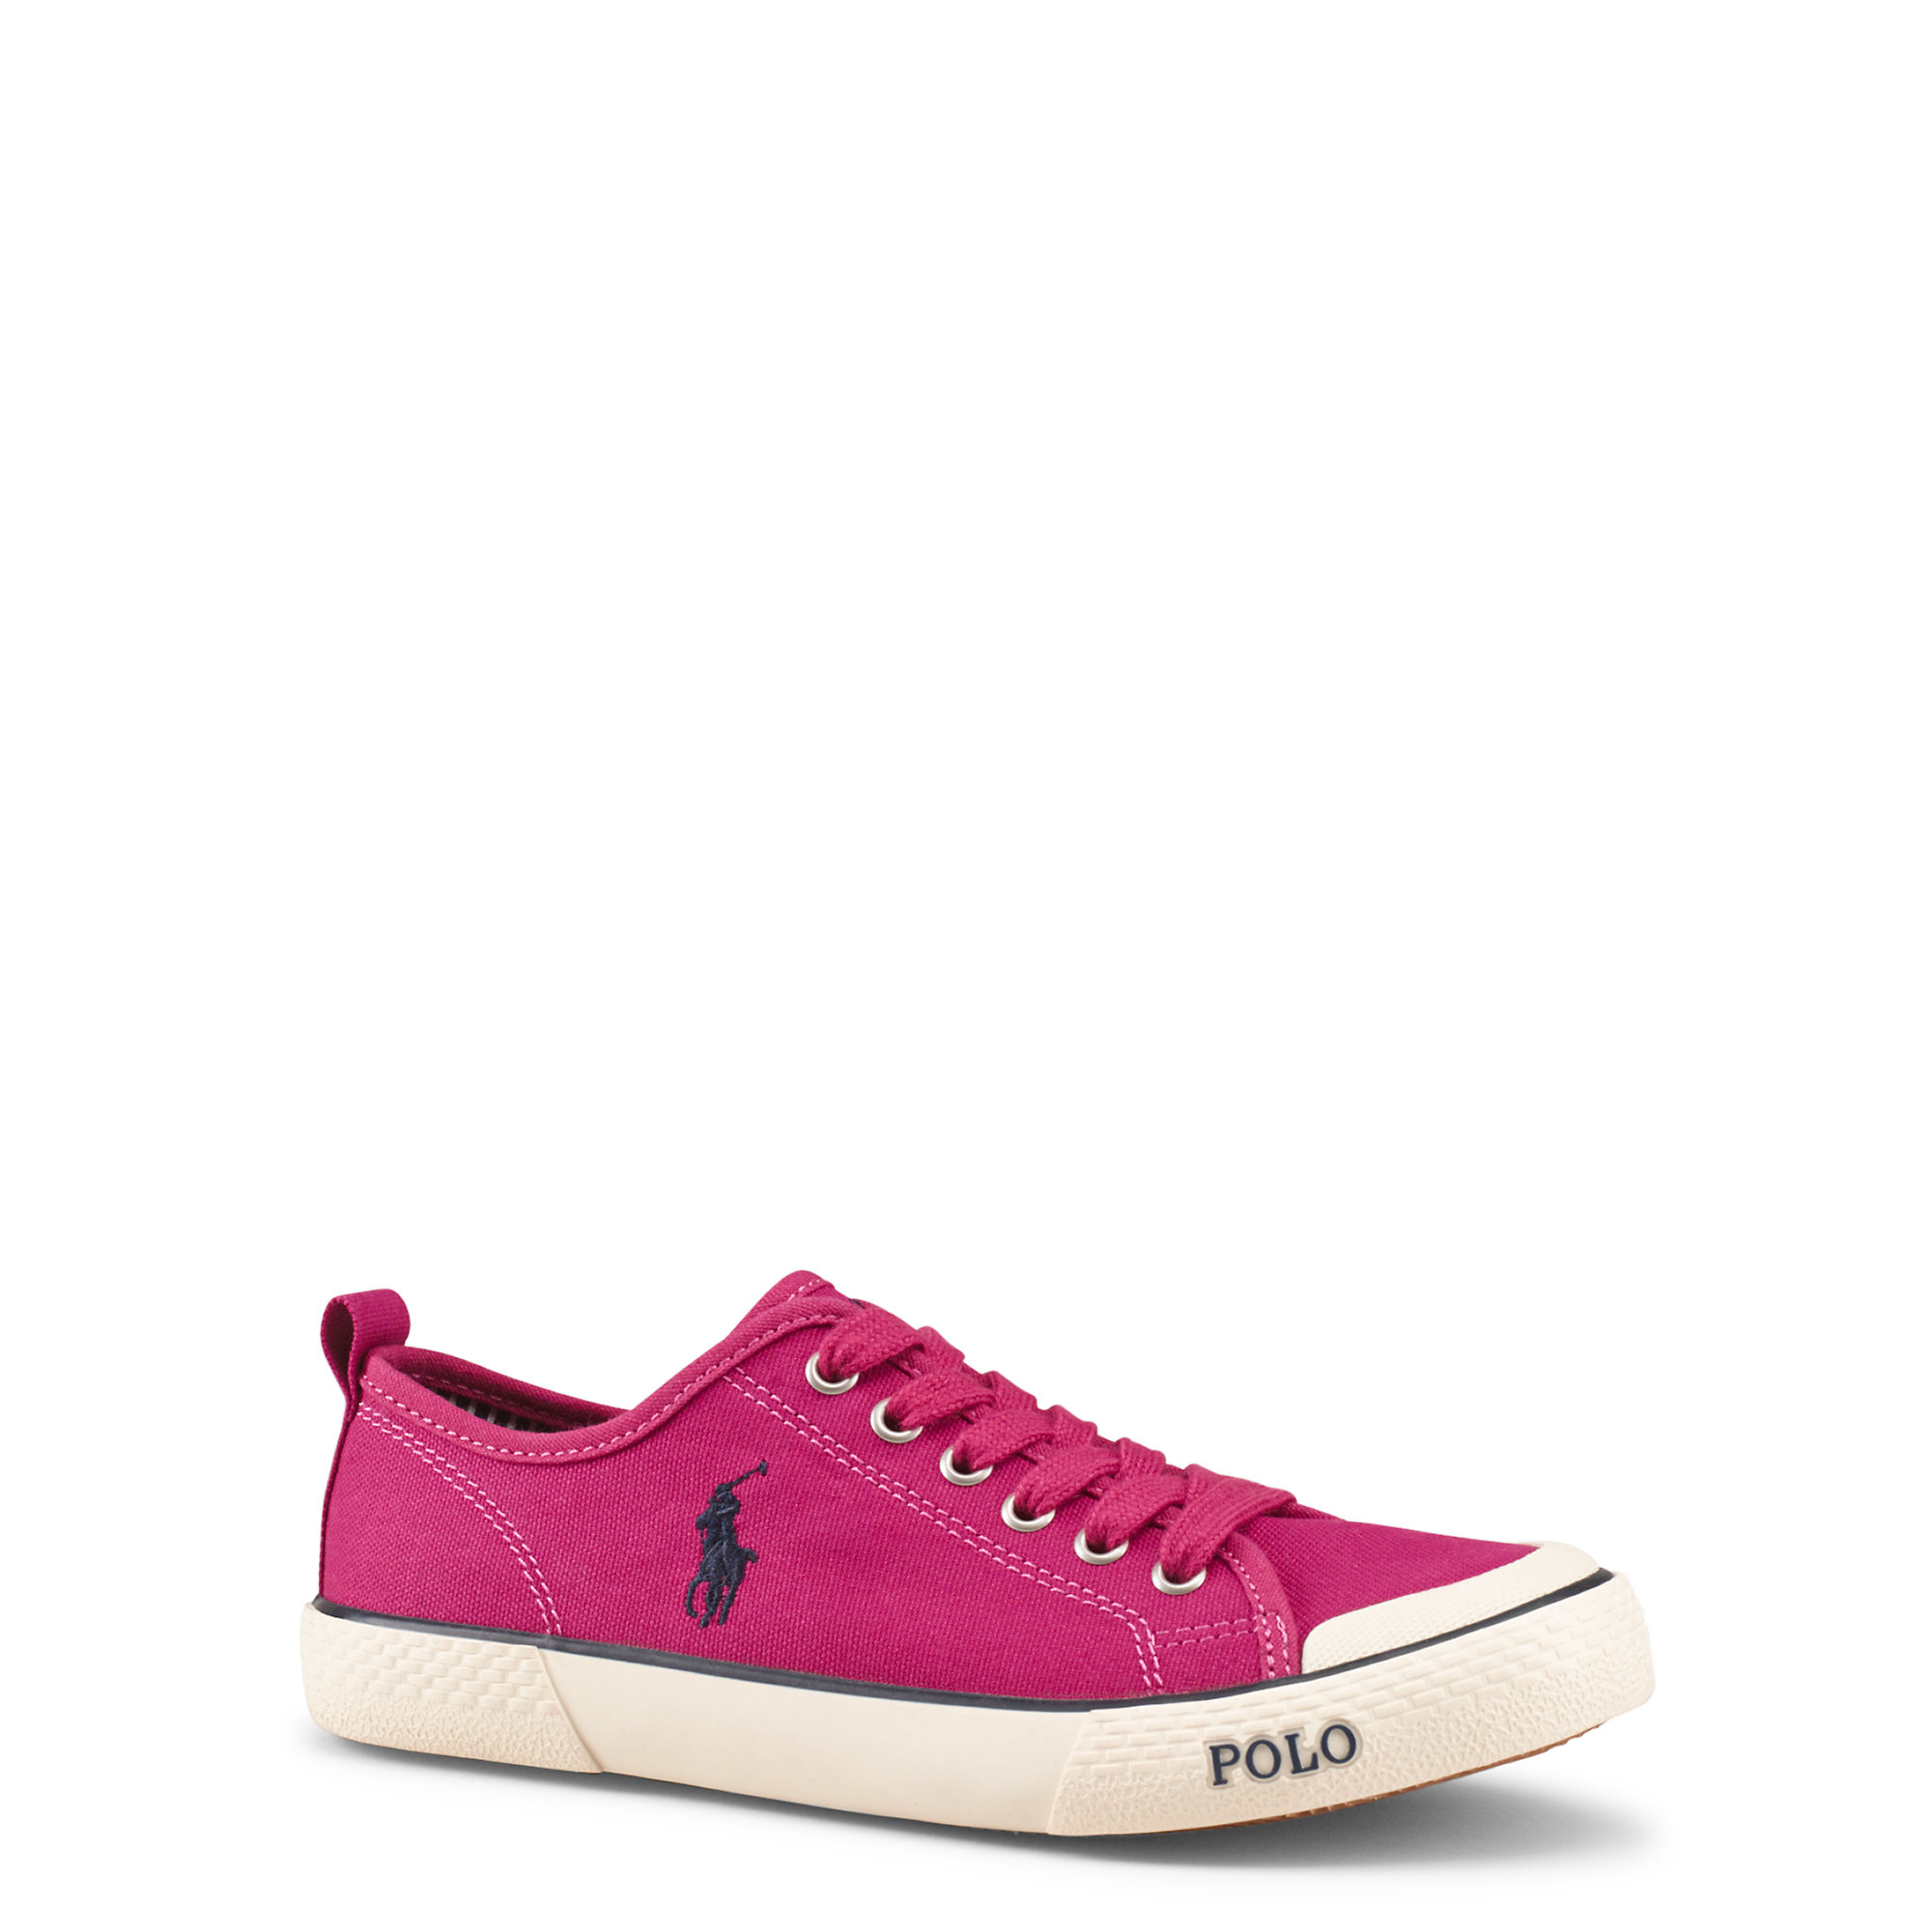 Lyst - Ralph Lauren Carlisle Ii Sneaker in Pink af70430d8f2